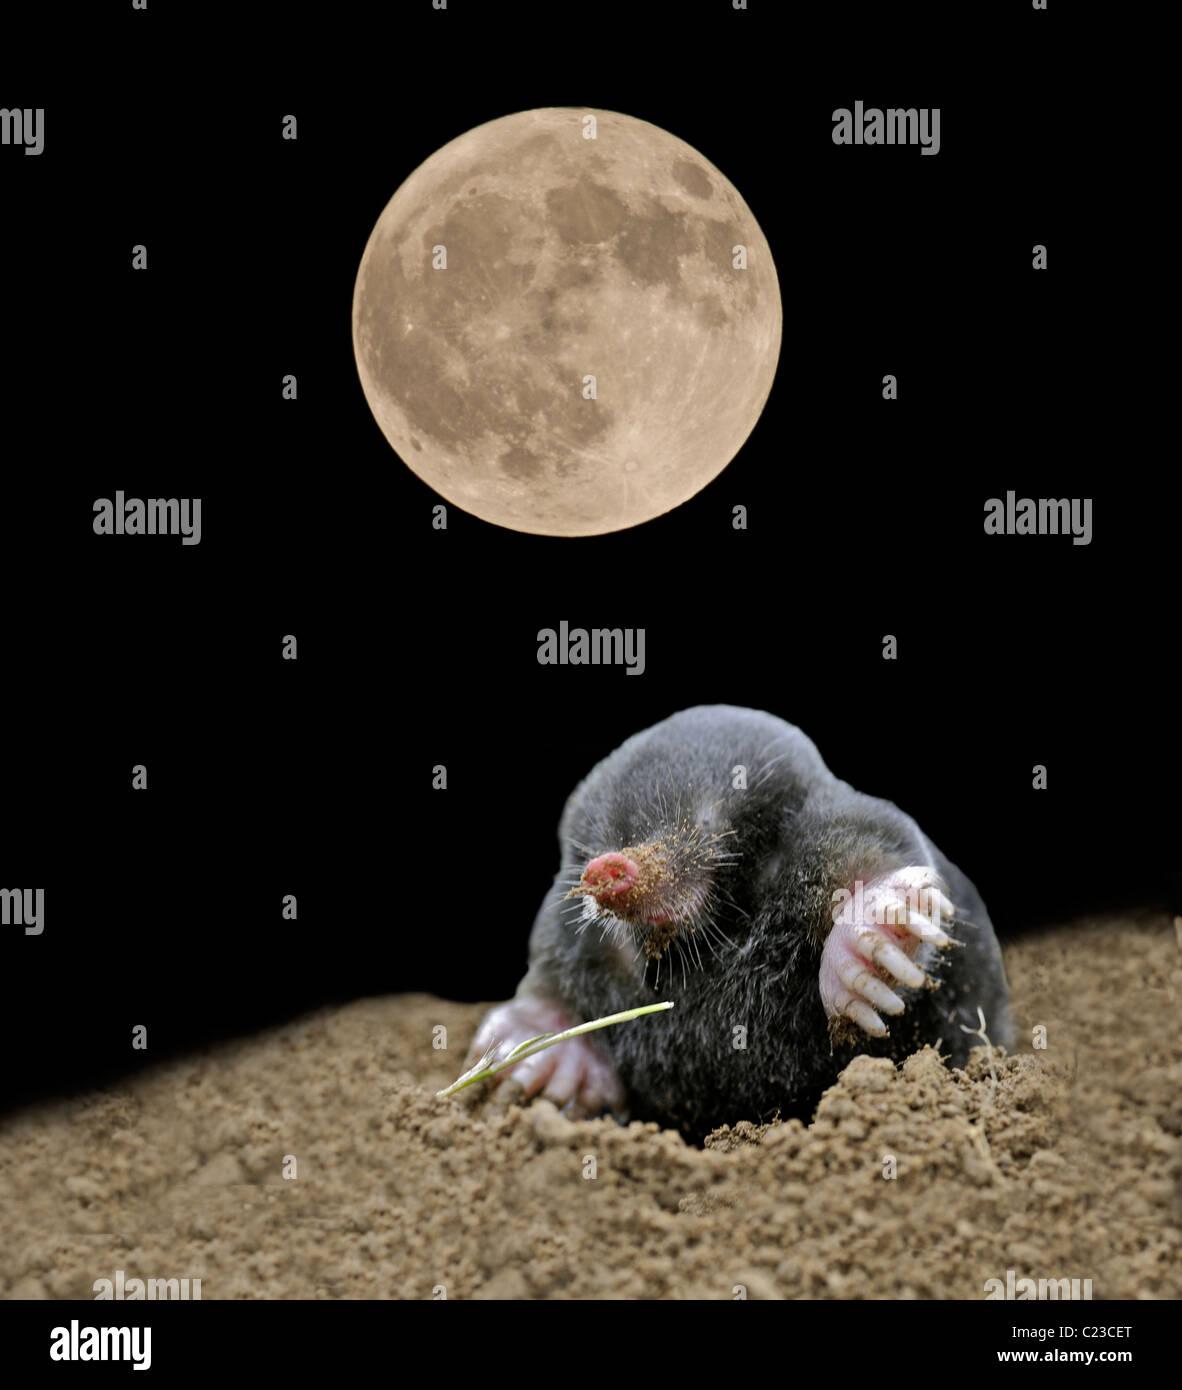 Mole common mole (Talpa europaea) by moonlight (digitally enhanced image) - Stock Image